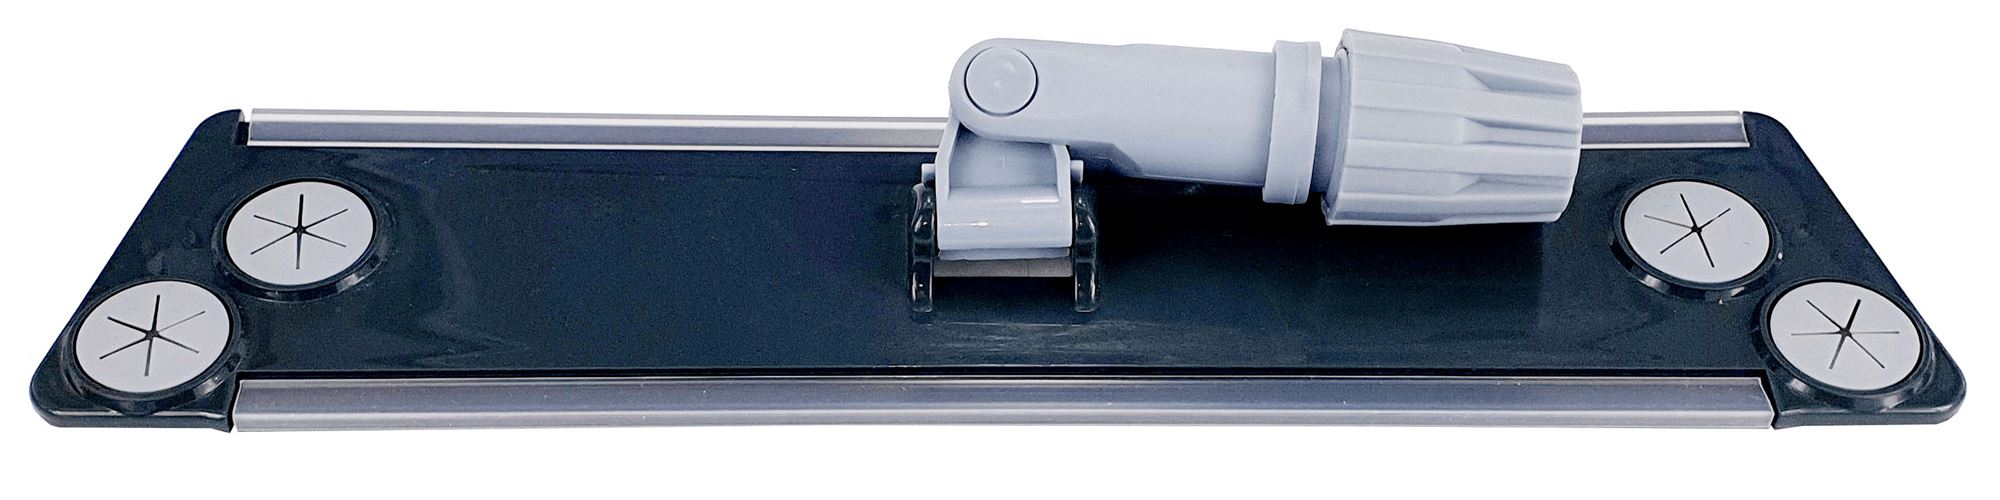 balai frange microfibre trap ze 40 cm. Black Bedroom Furniture Sets. Home Design Ideas